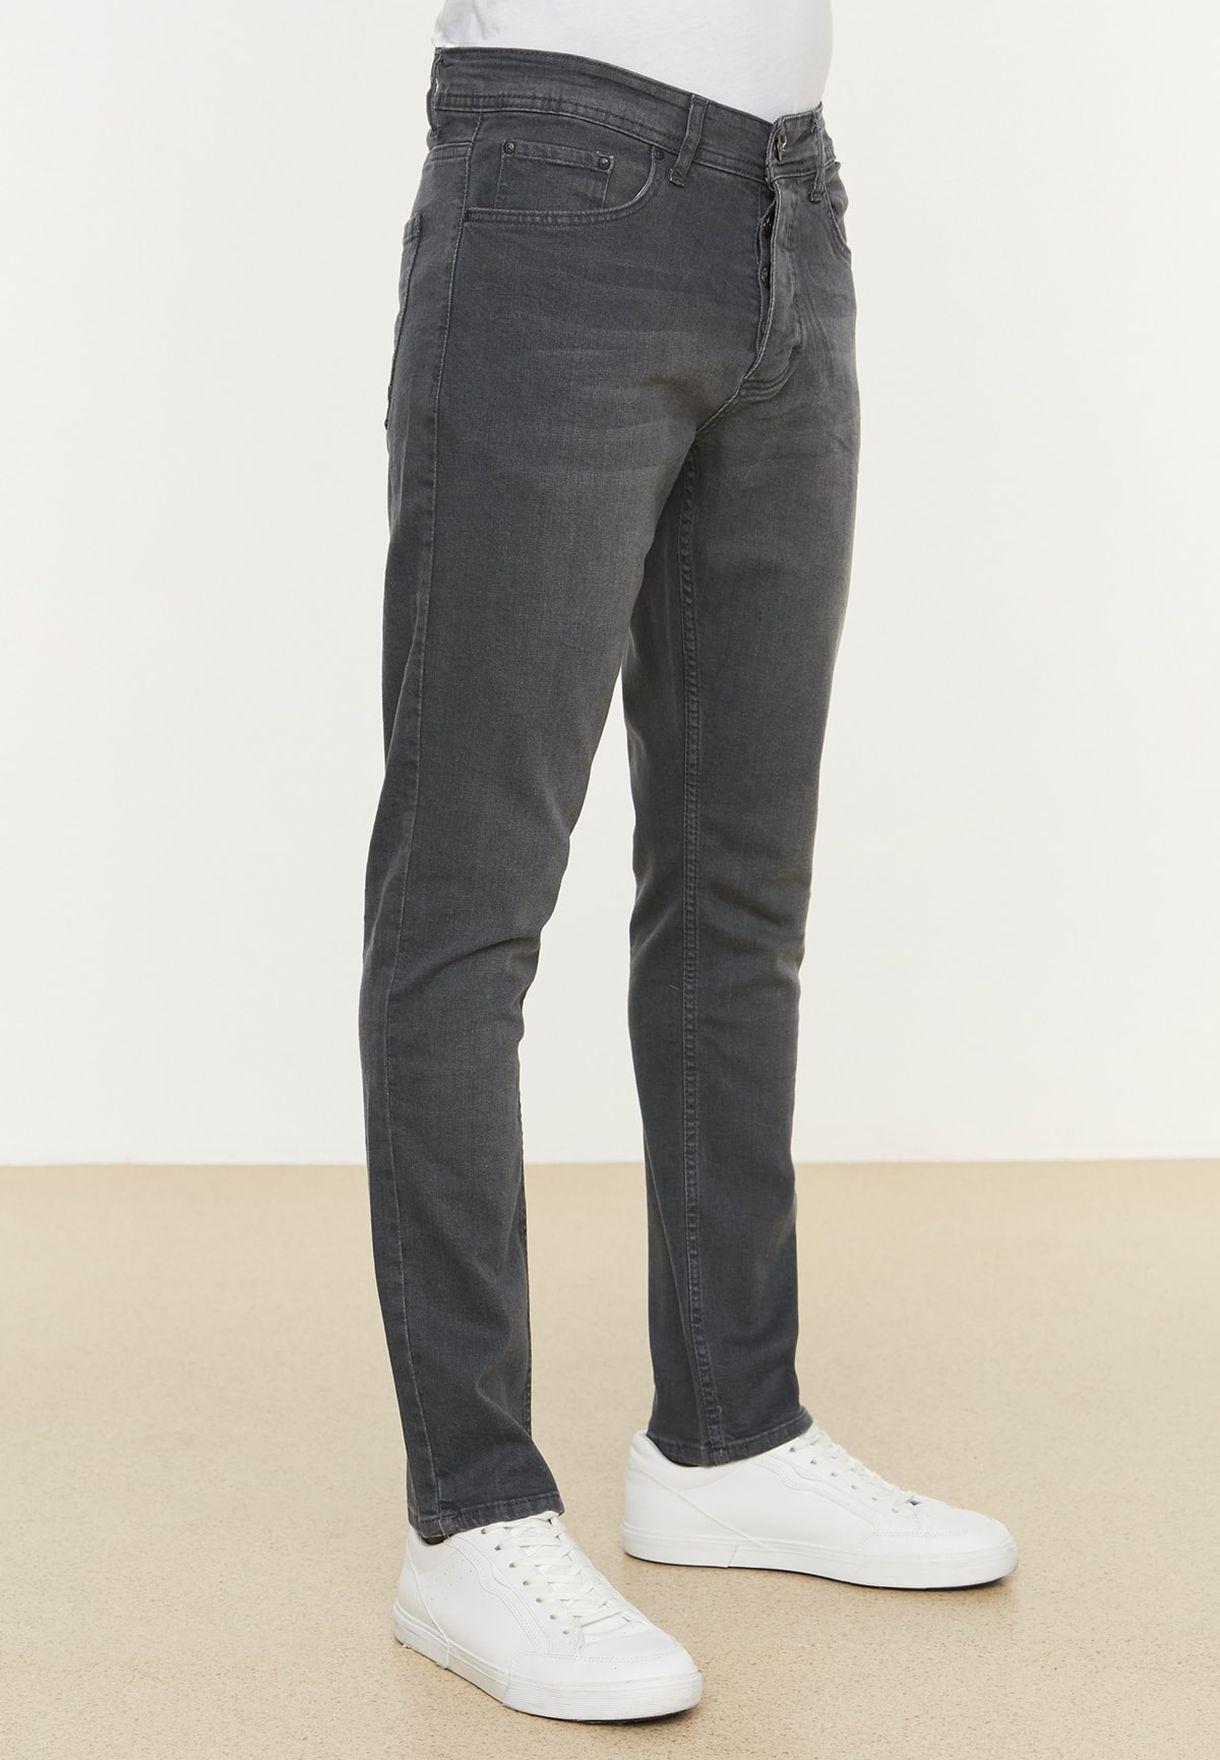 Light Wash Slim Fit Jeans